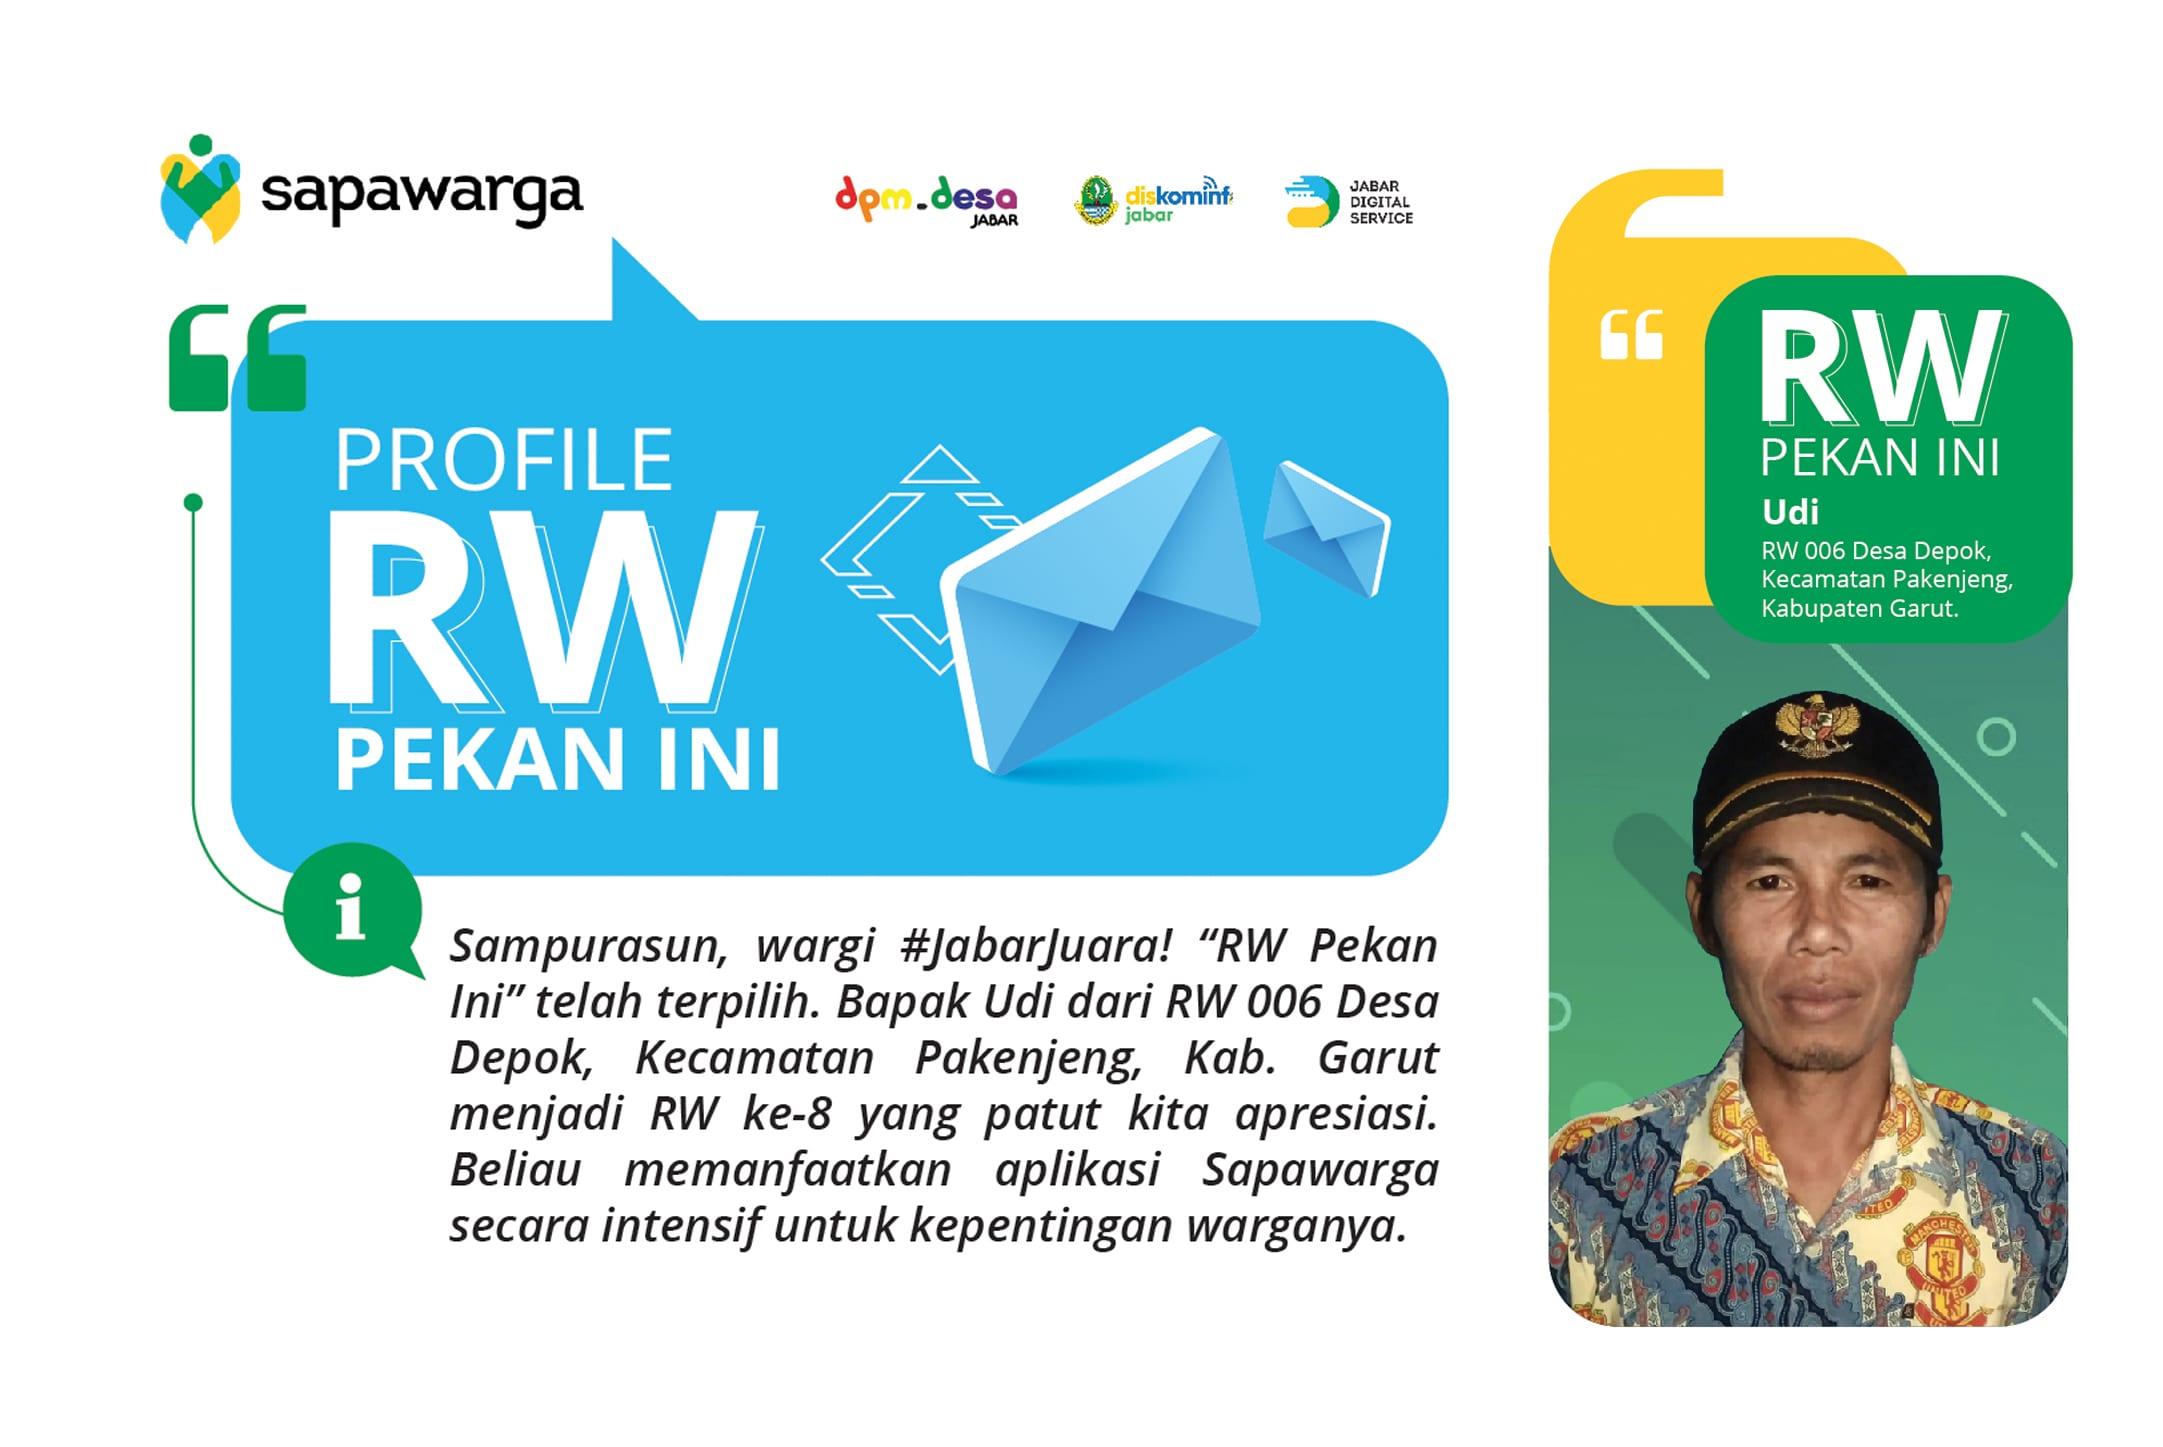 Rw Pekan Ini Bapak Udi Desa Depok Kecamatan Pakenjeng Kabupaten Garut Jabar Digital Service